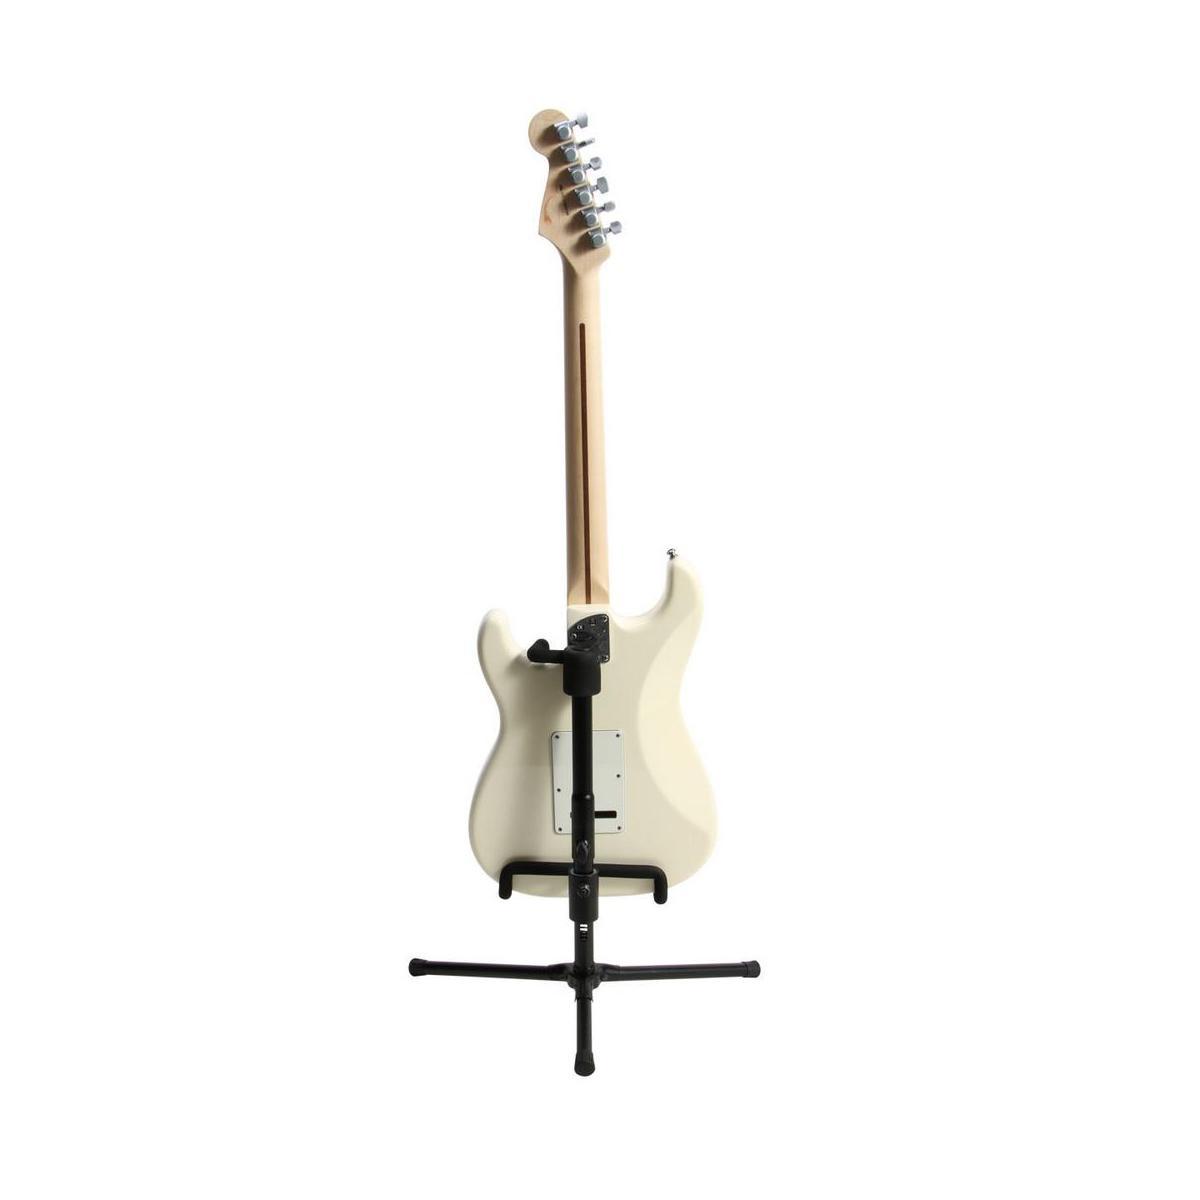 on stage gs7140 spring up locking guitar stand musical instruments. Black Bedroom Furniture Sets. Home Design Ideas